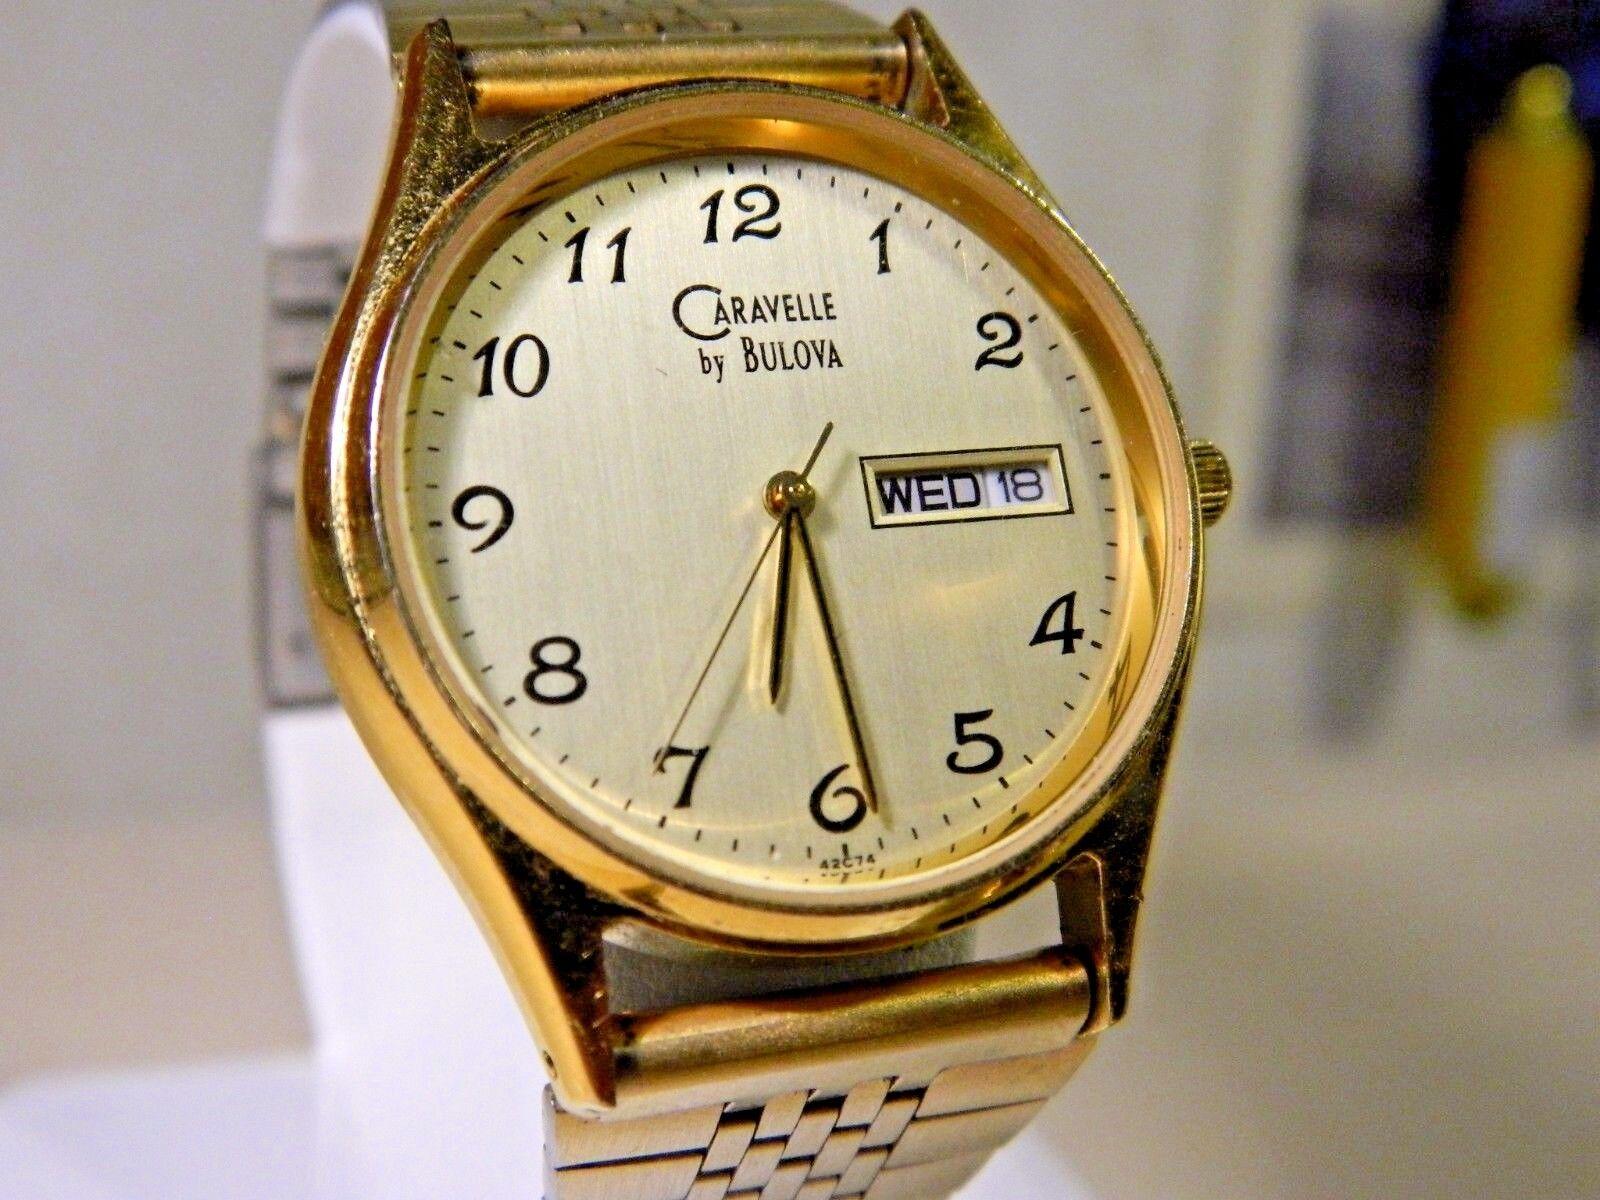 d95ac6335e9 Detalhes sobre Bonito Ln Vintage Bulova Caravelle Dourado Relógio Masculino  Calendário. 2 Ano De Garantia!- mostrar título no original